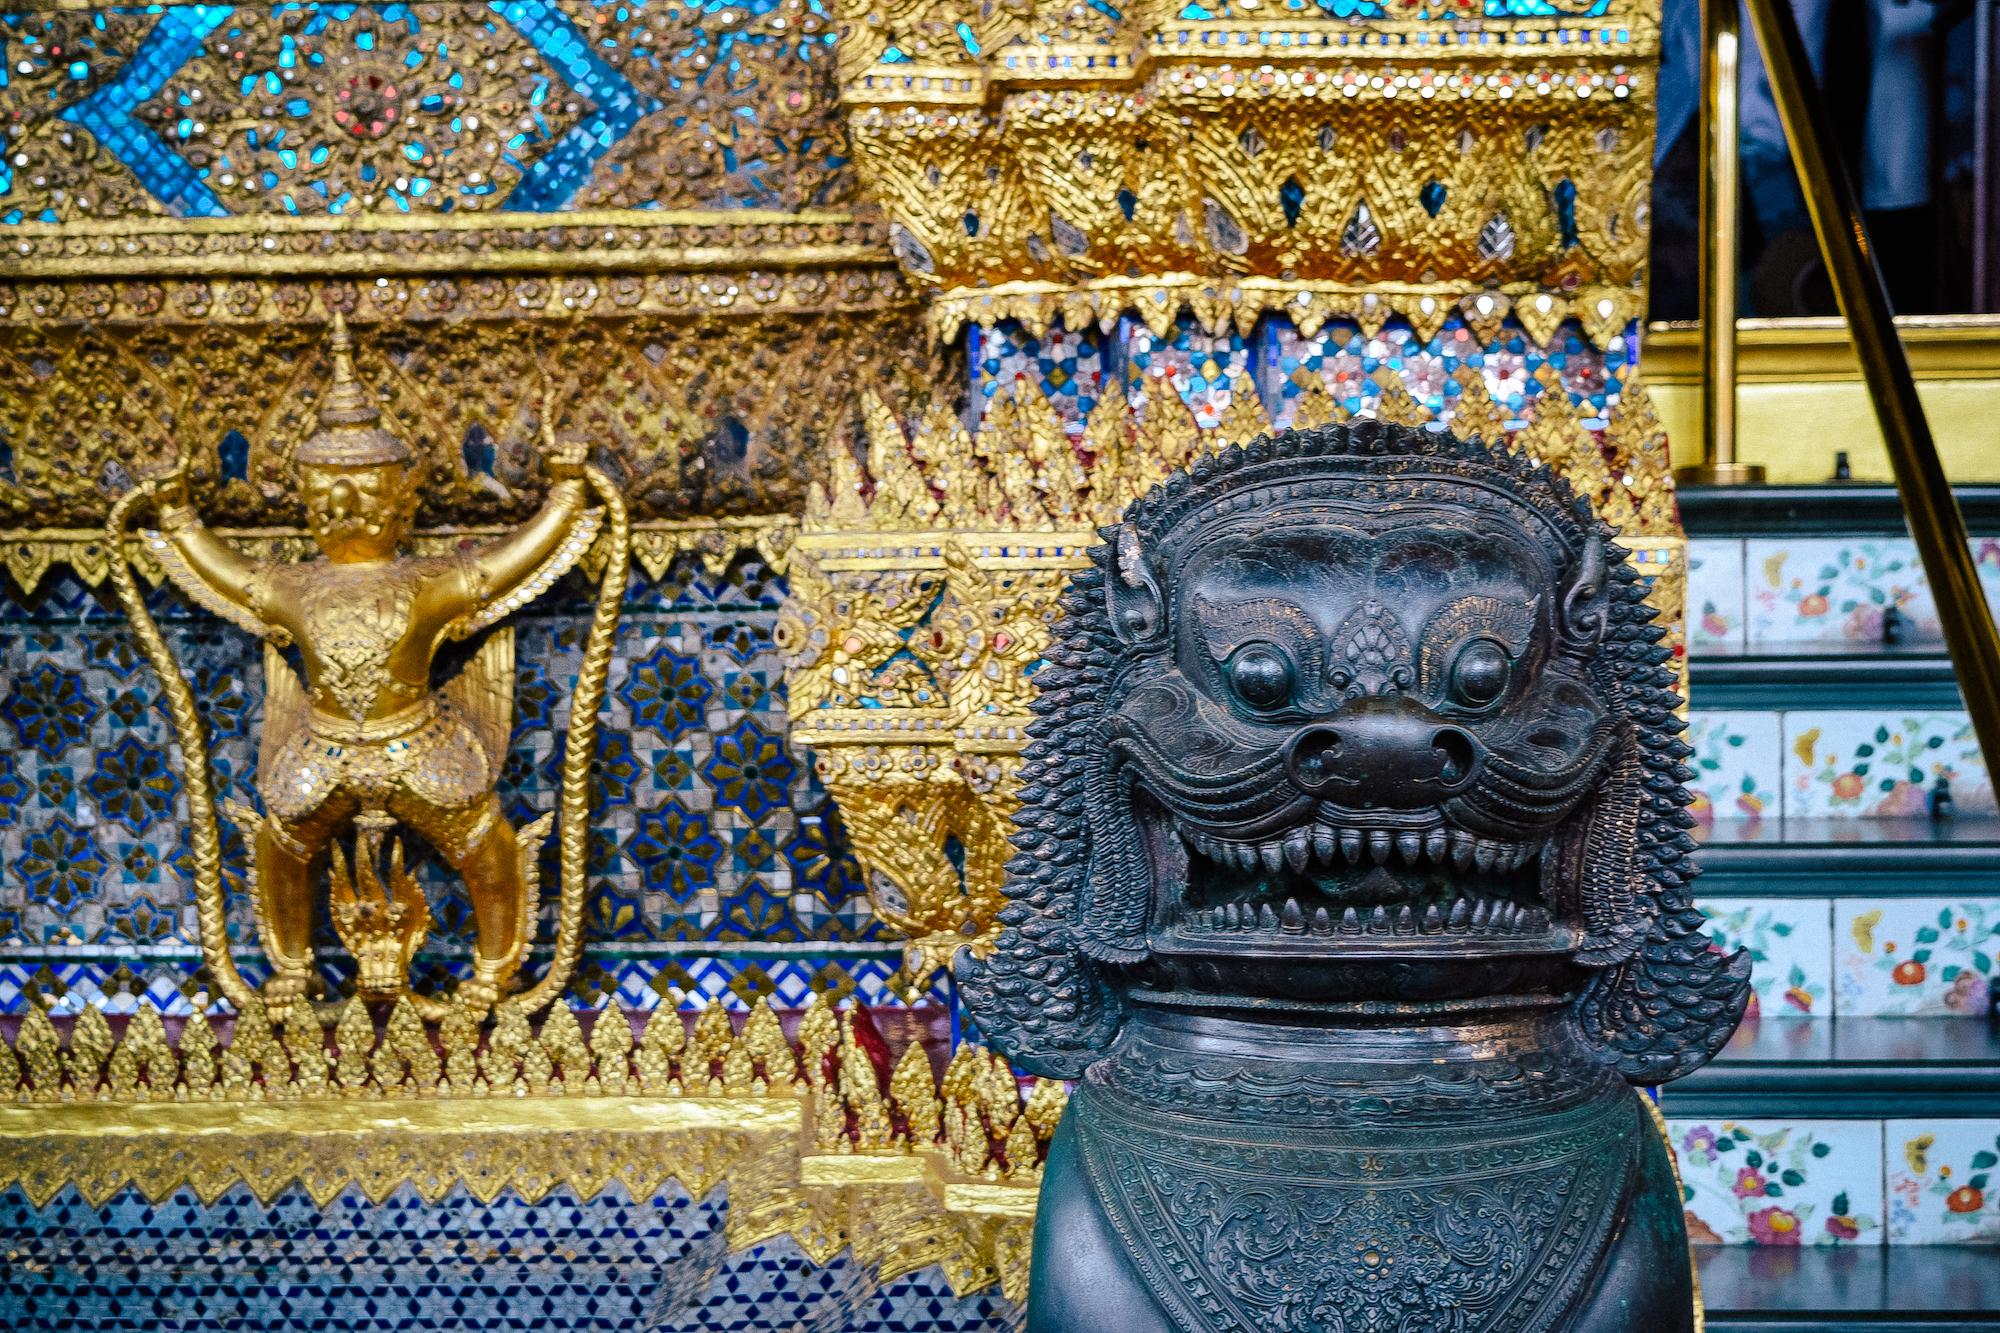 statue in emerald city bangkok